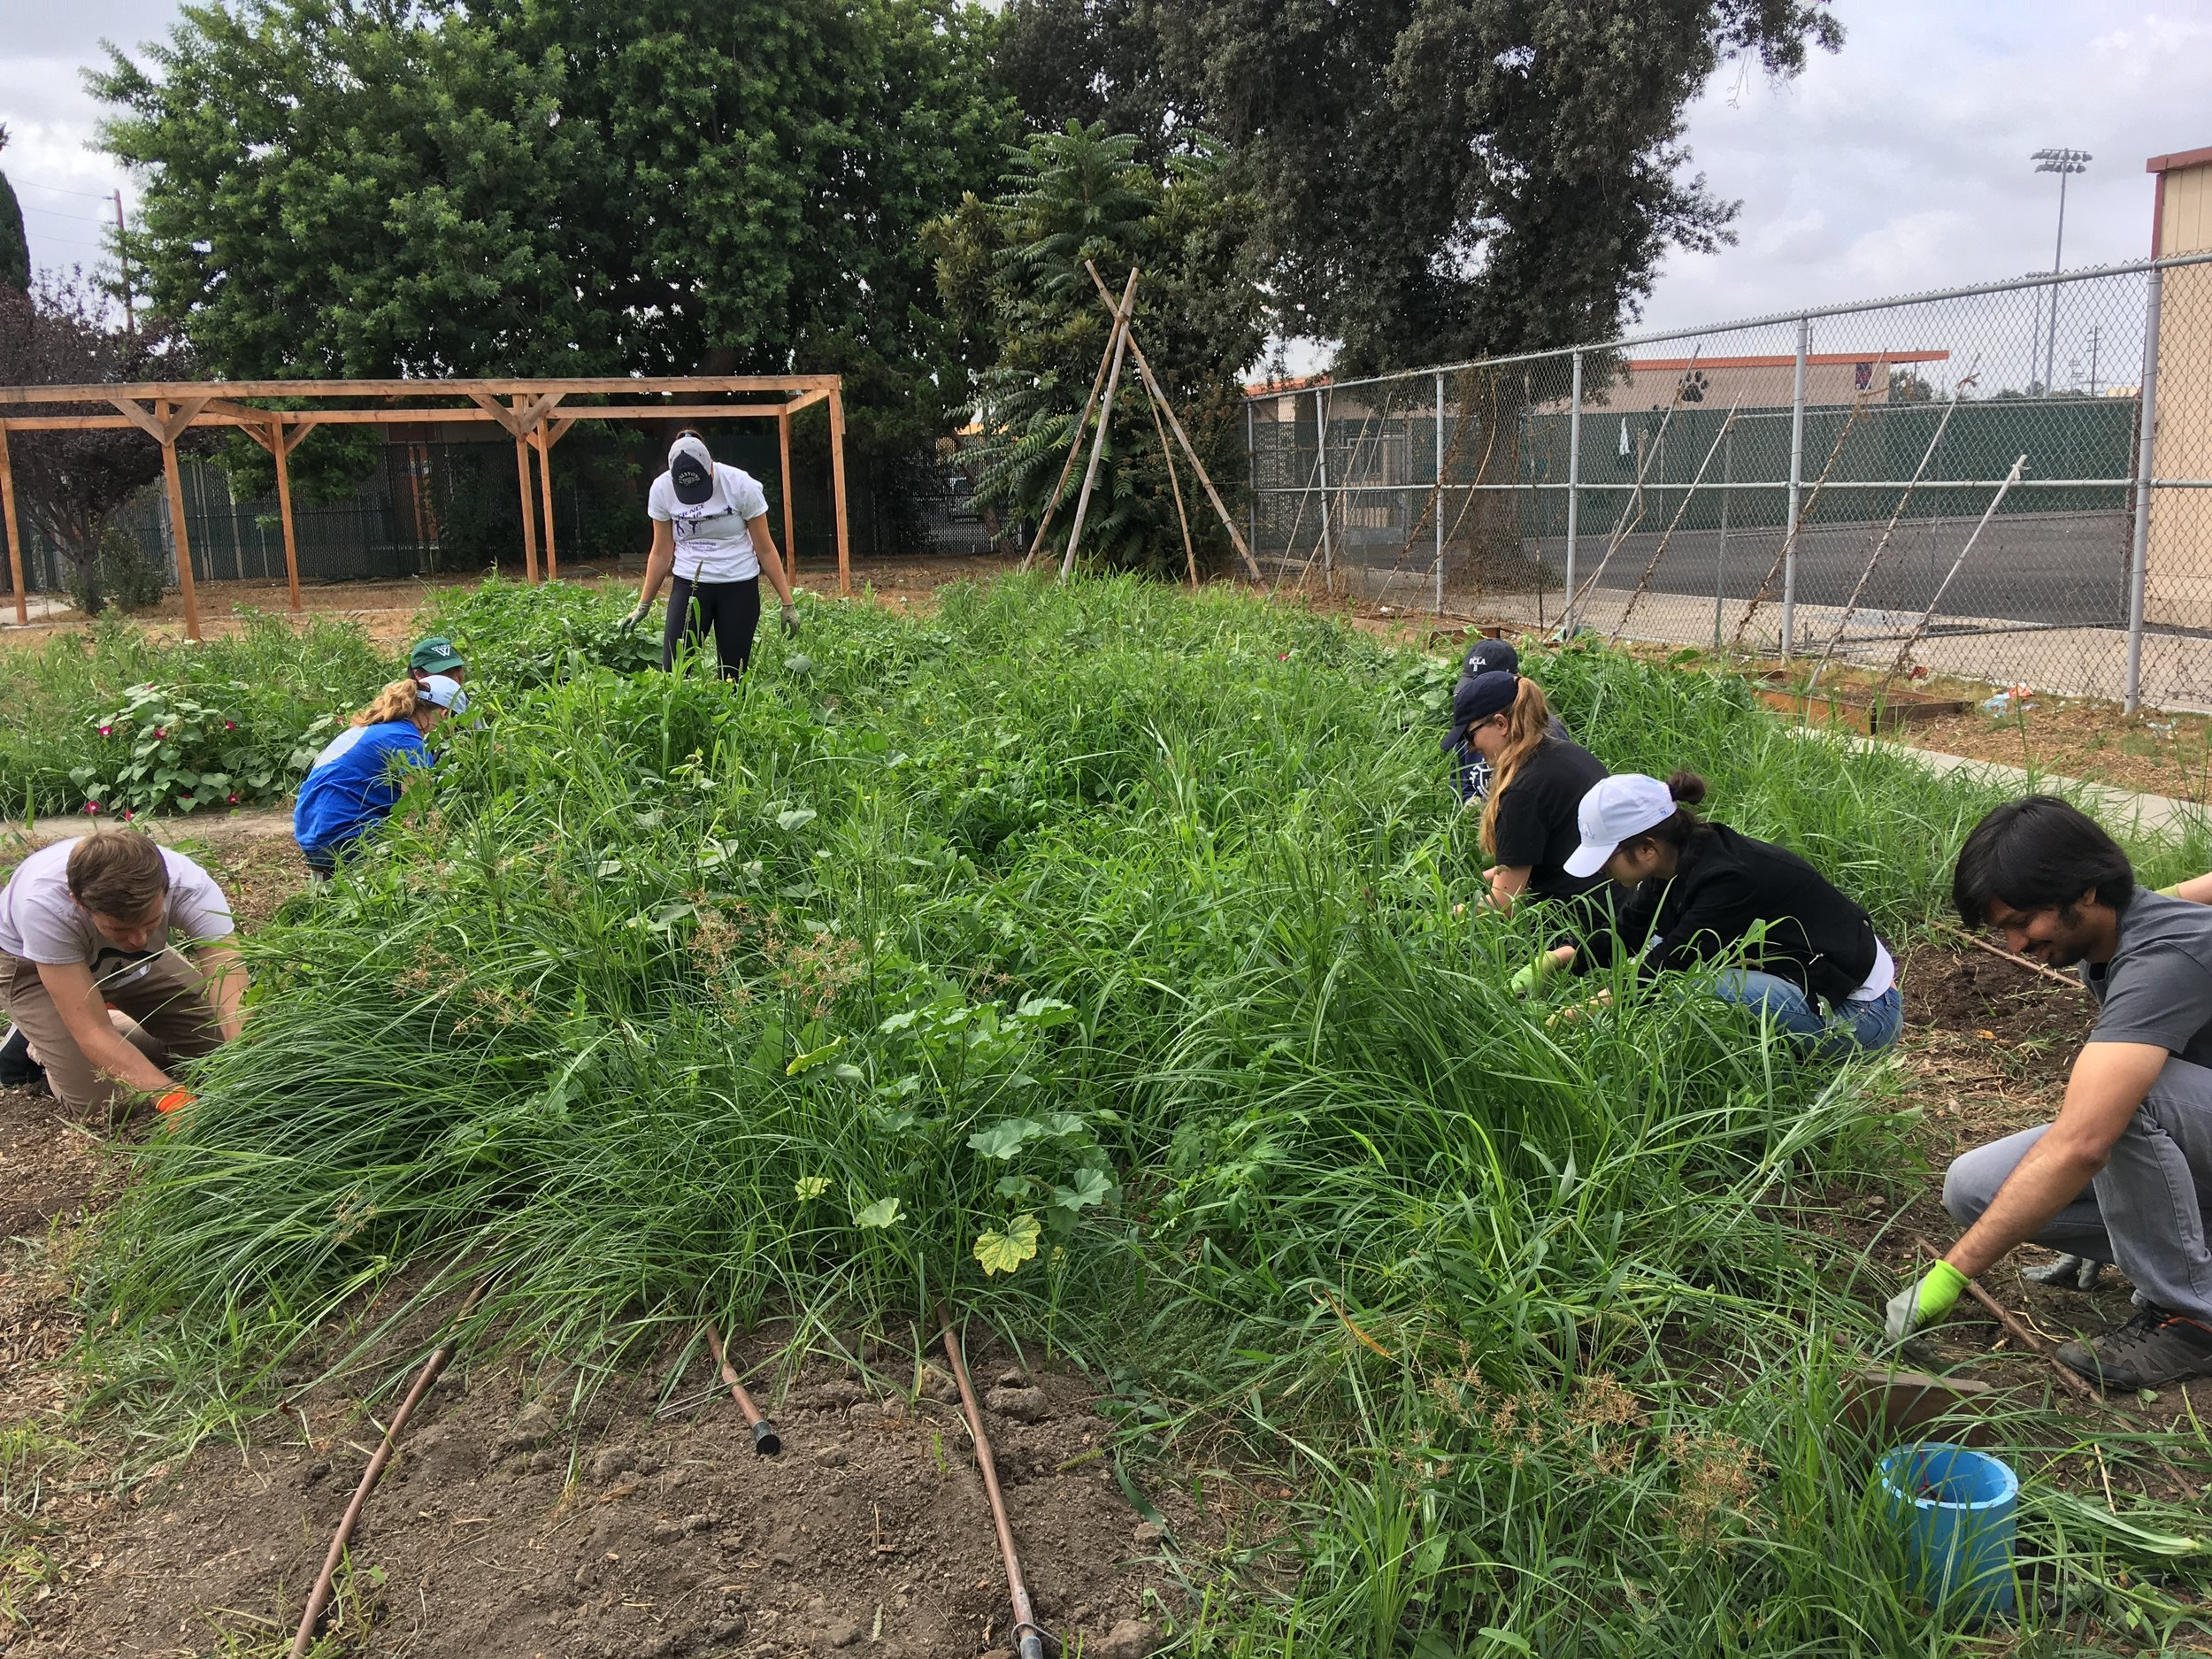 October 6, 2018: Field Lab Visit to Watts Community Healing Garden